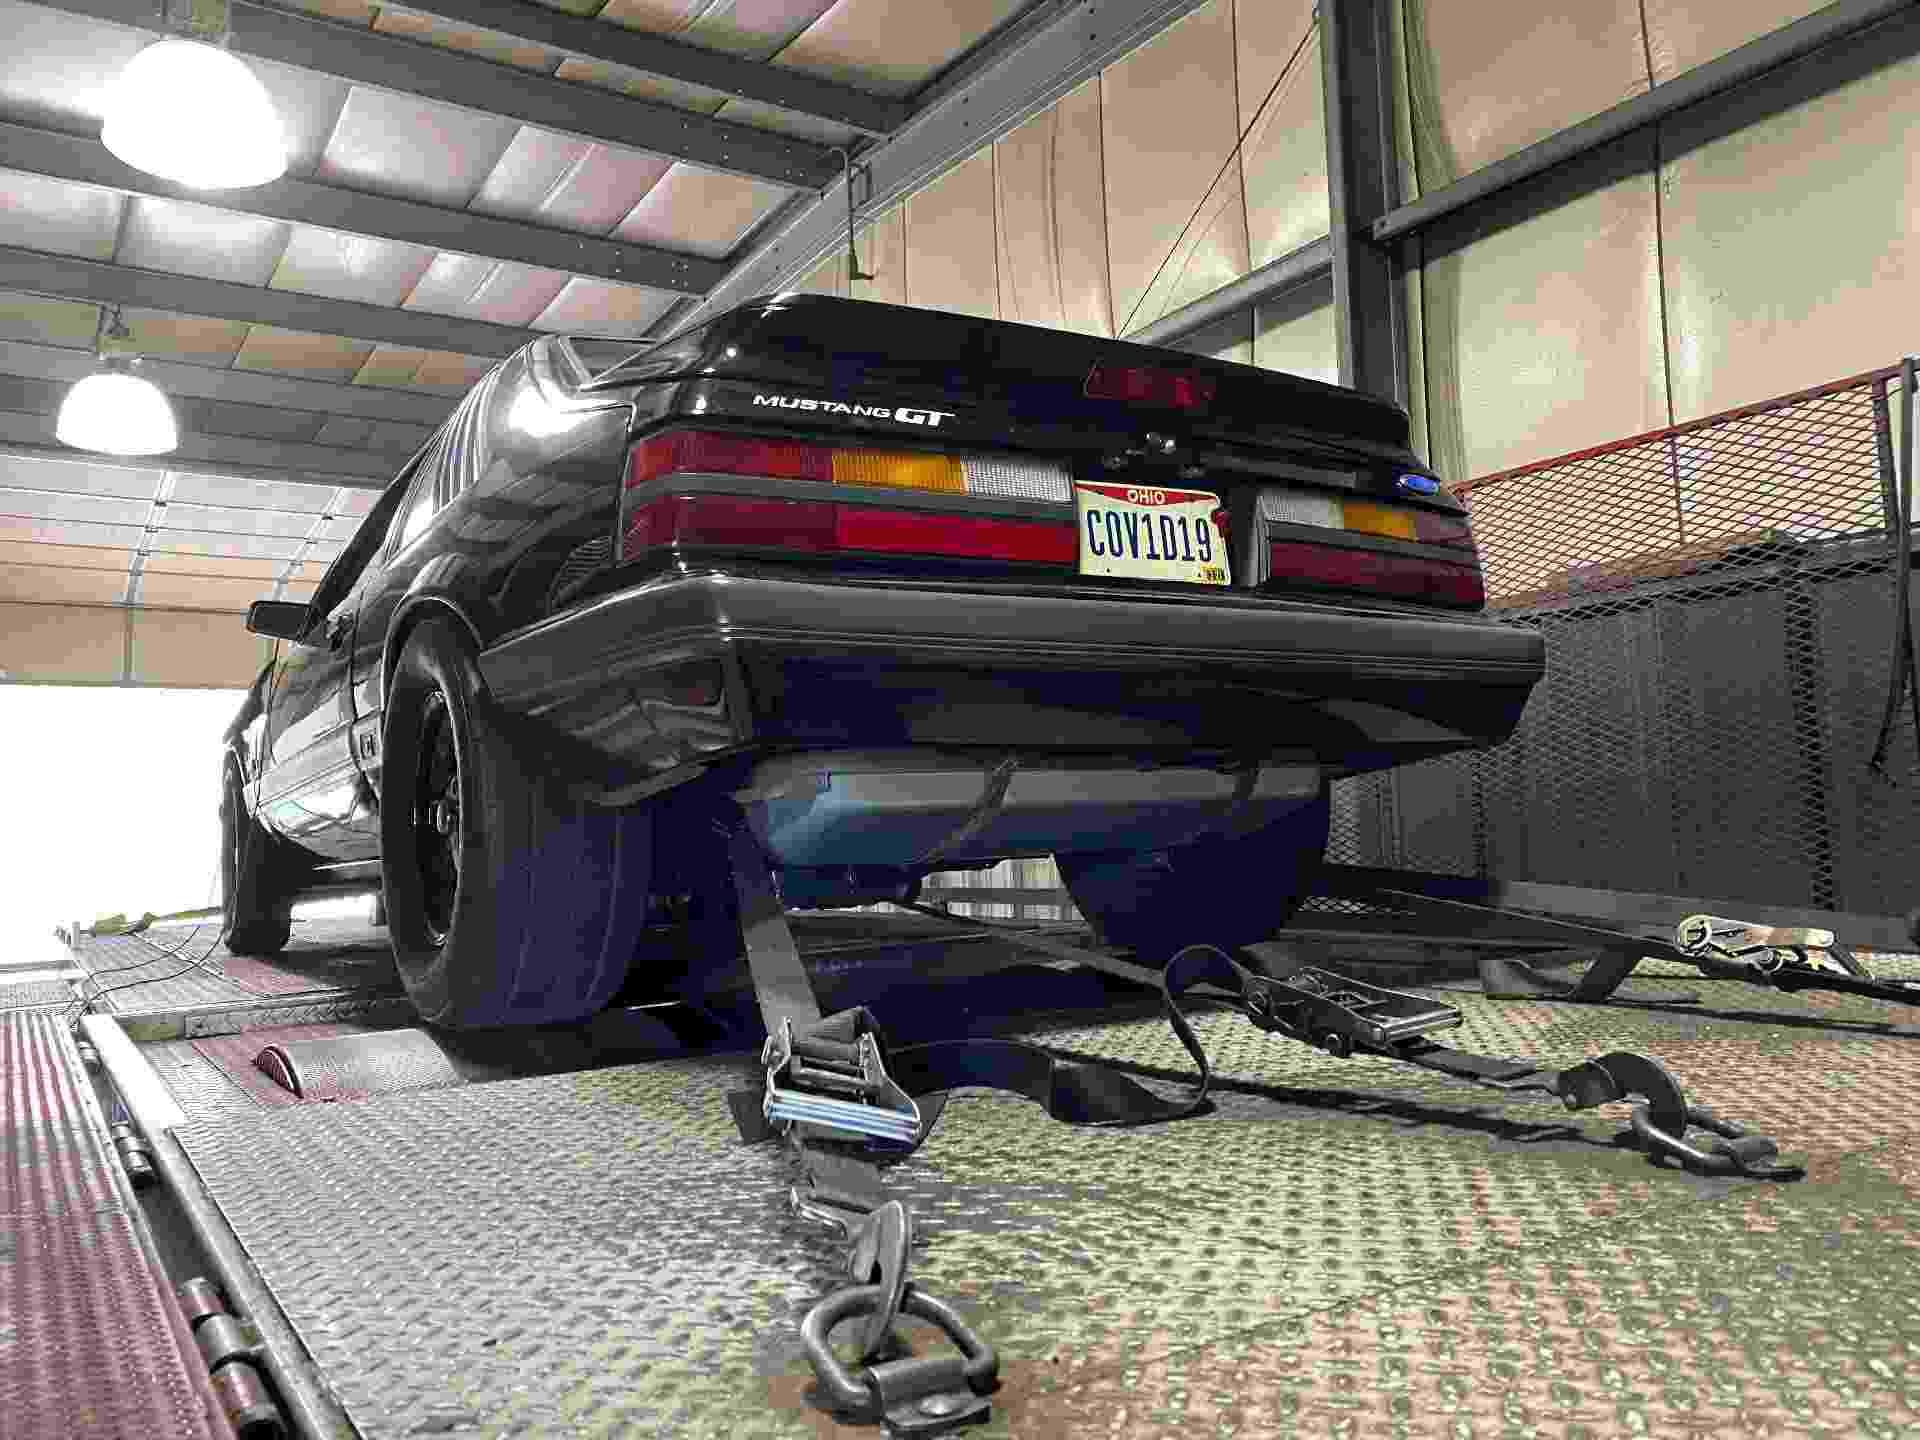 Brandon Ciriello Ford Mustang GT 1986 coronavírus COV1D19 - Arquivo pessoal